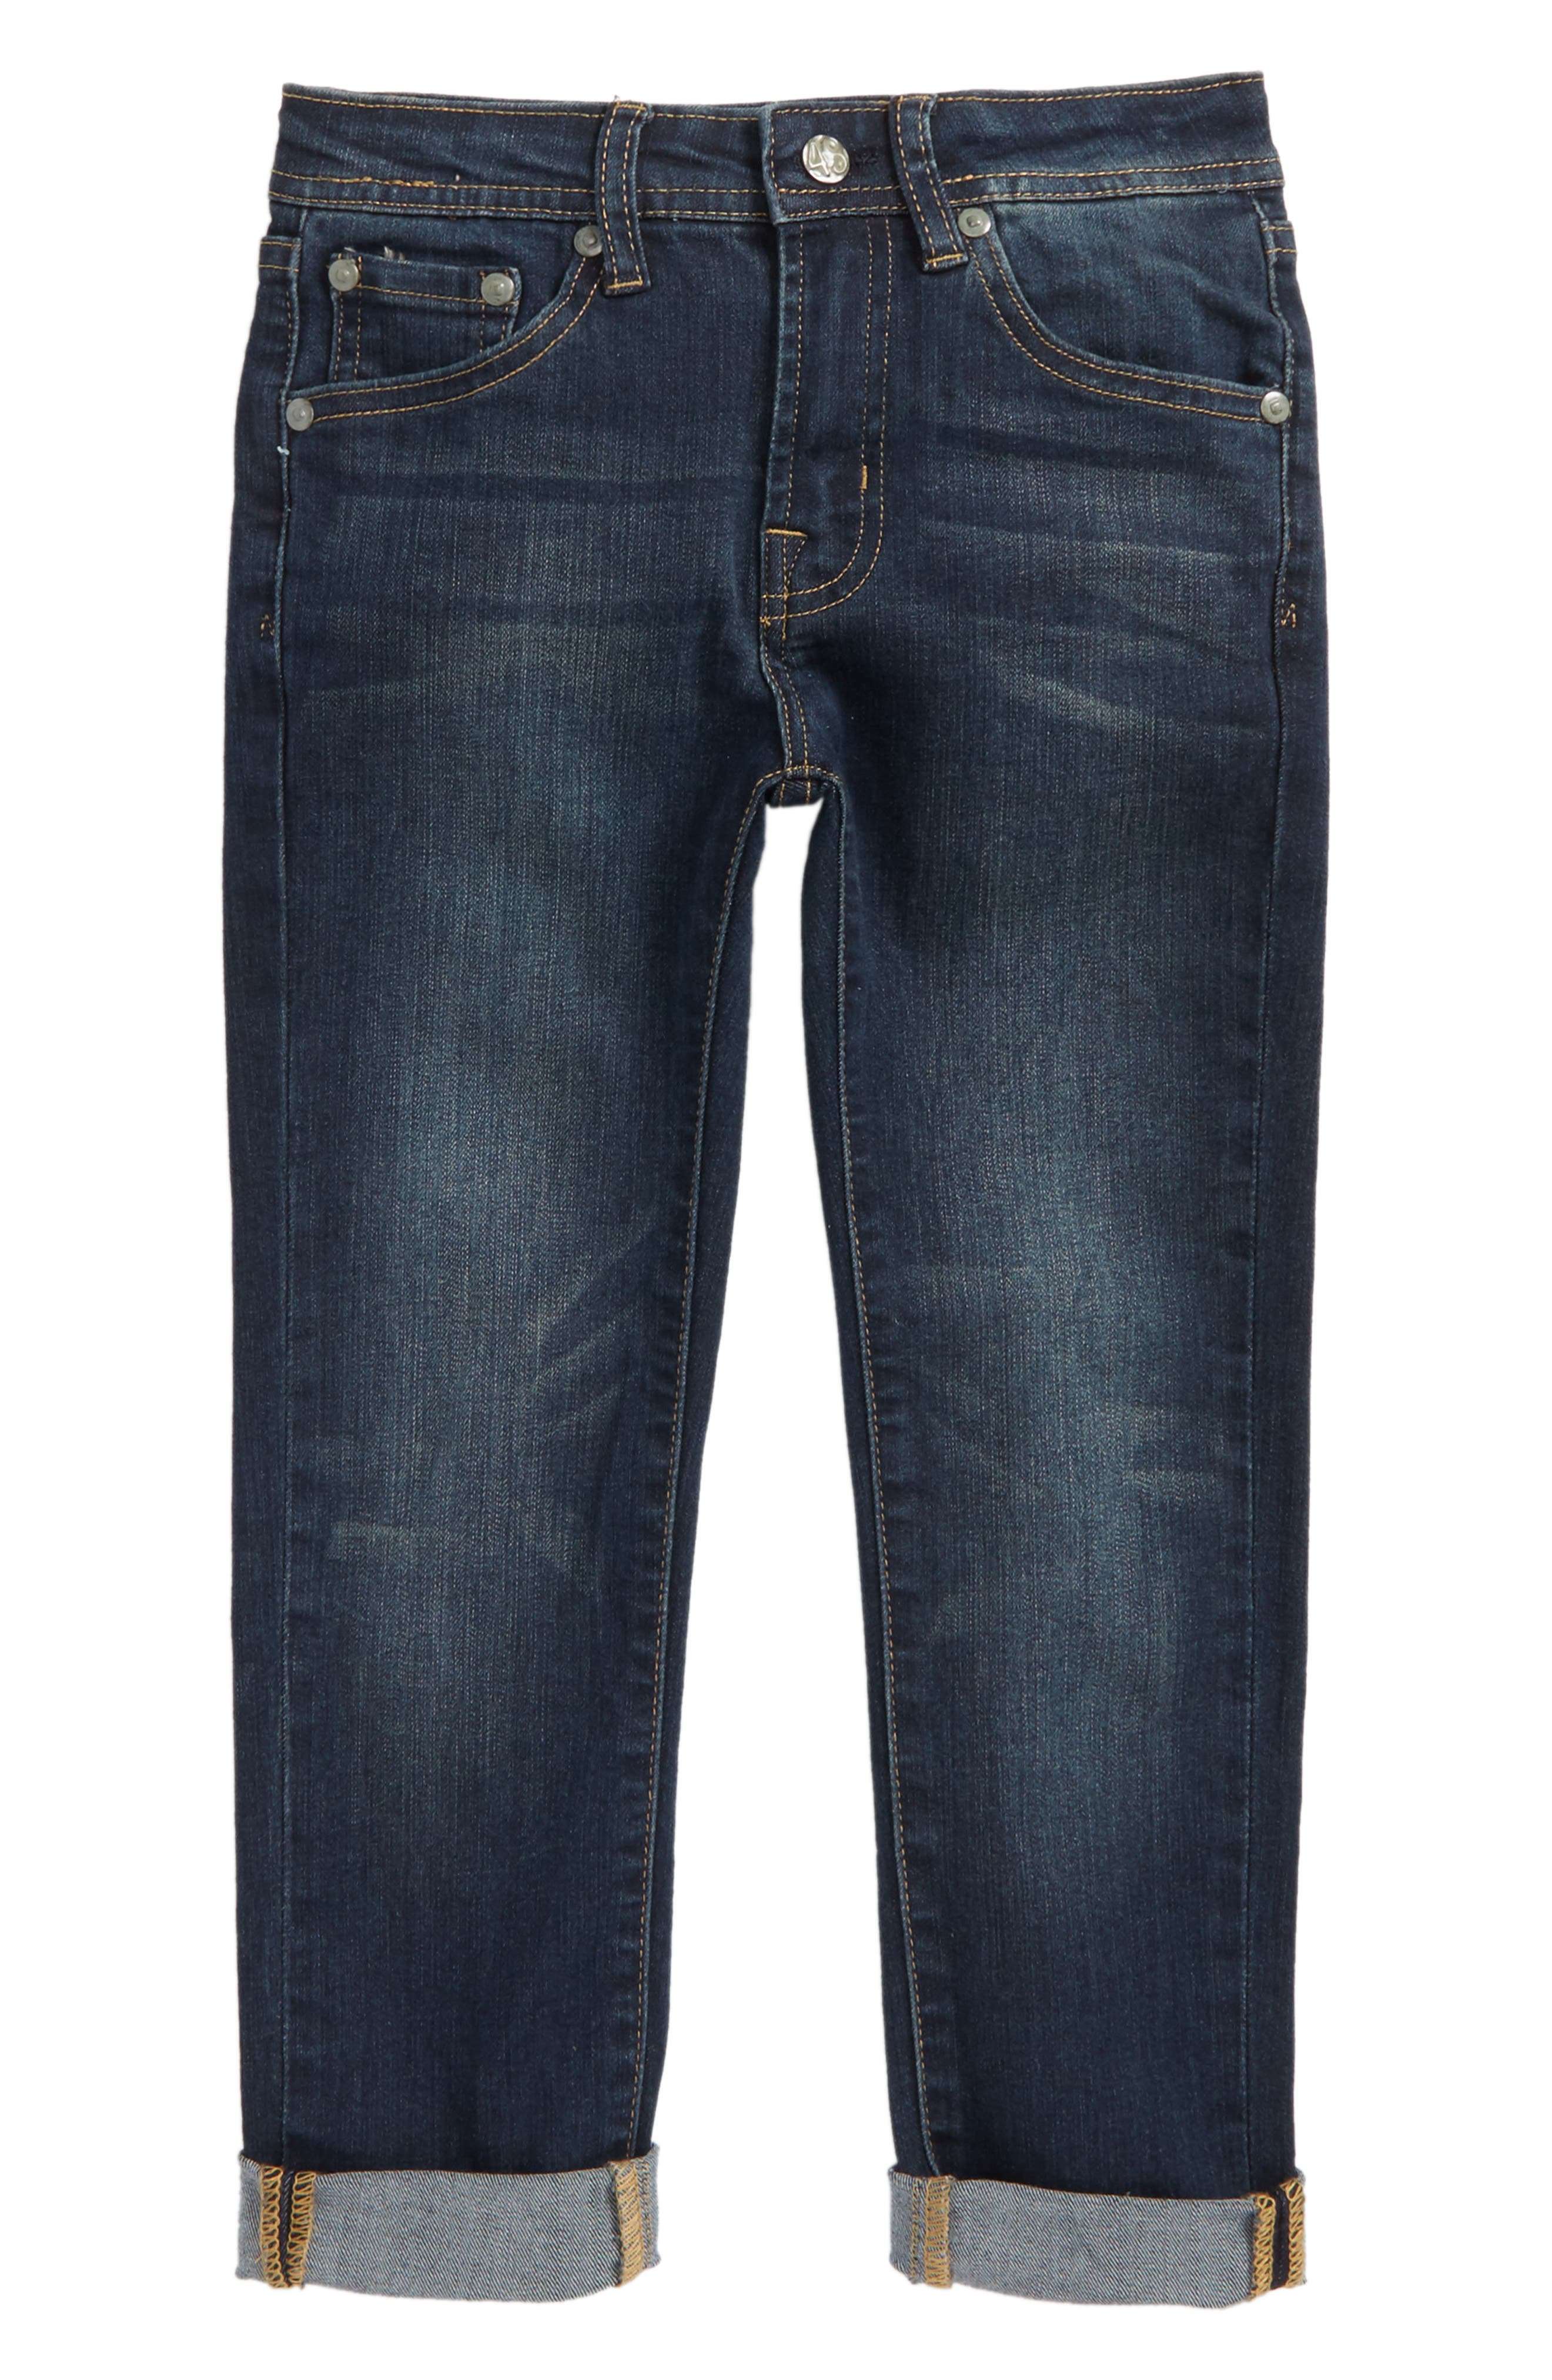 ag adriano goldschmied kids The James Slim Skinny Jeans (Toddler Boys & Little Boys)